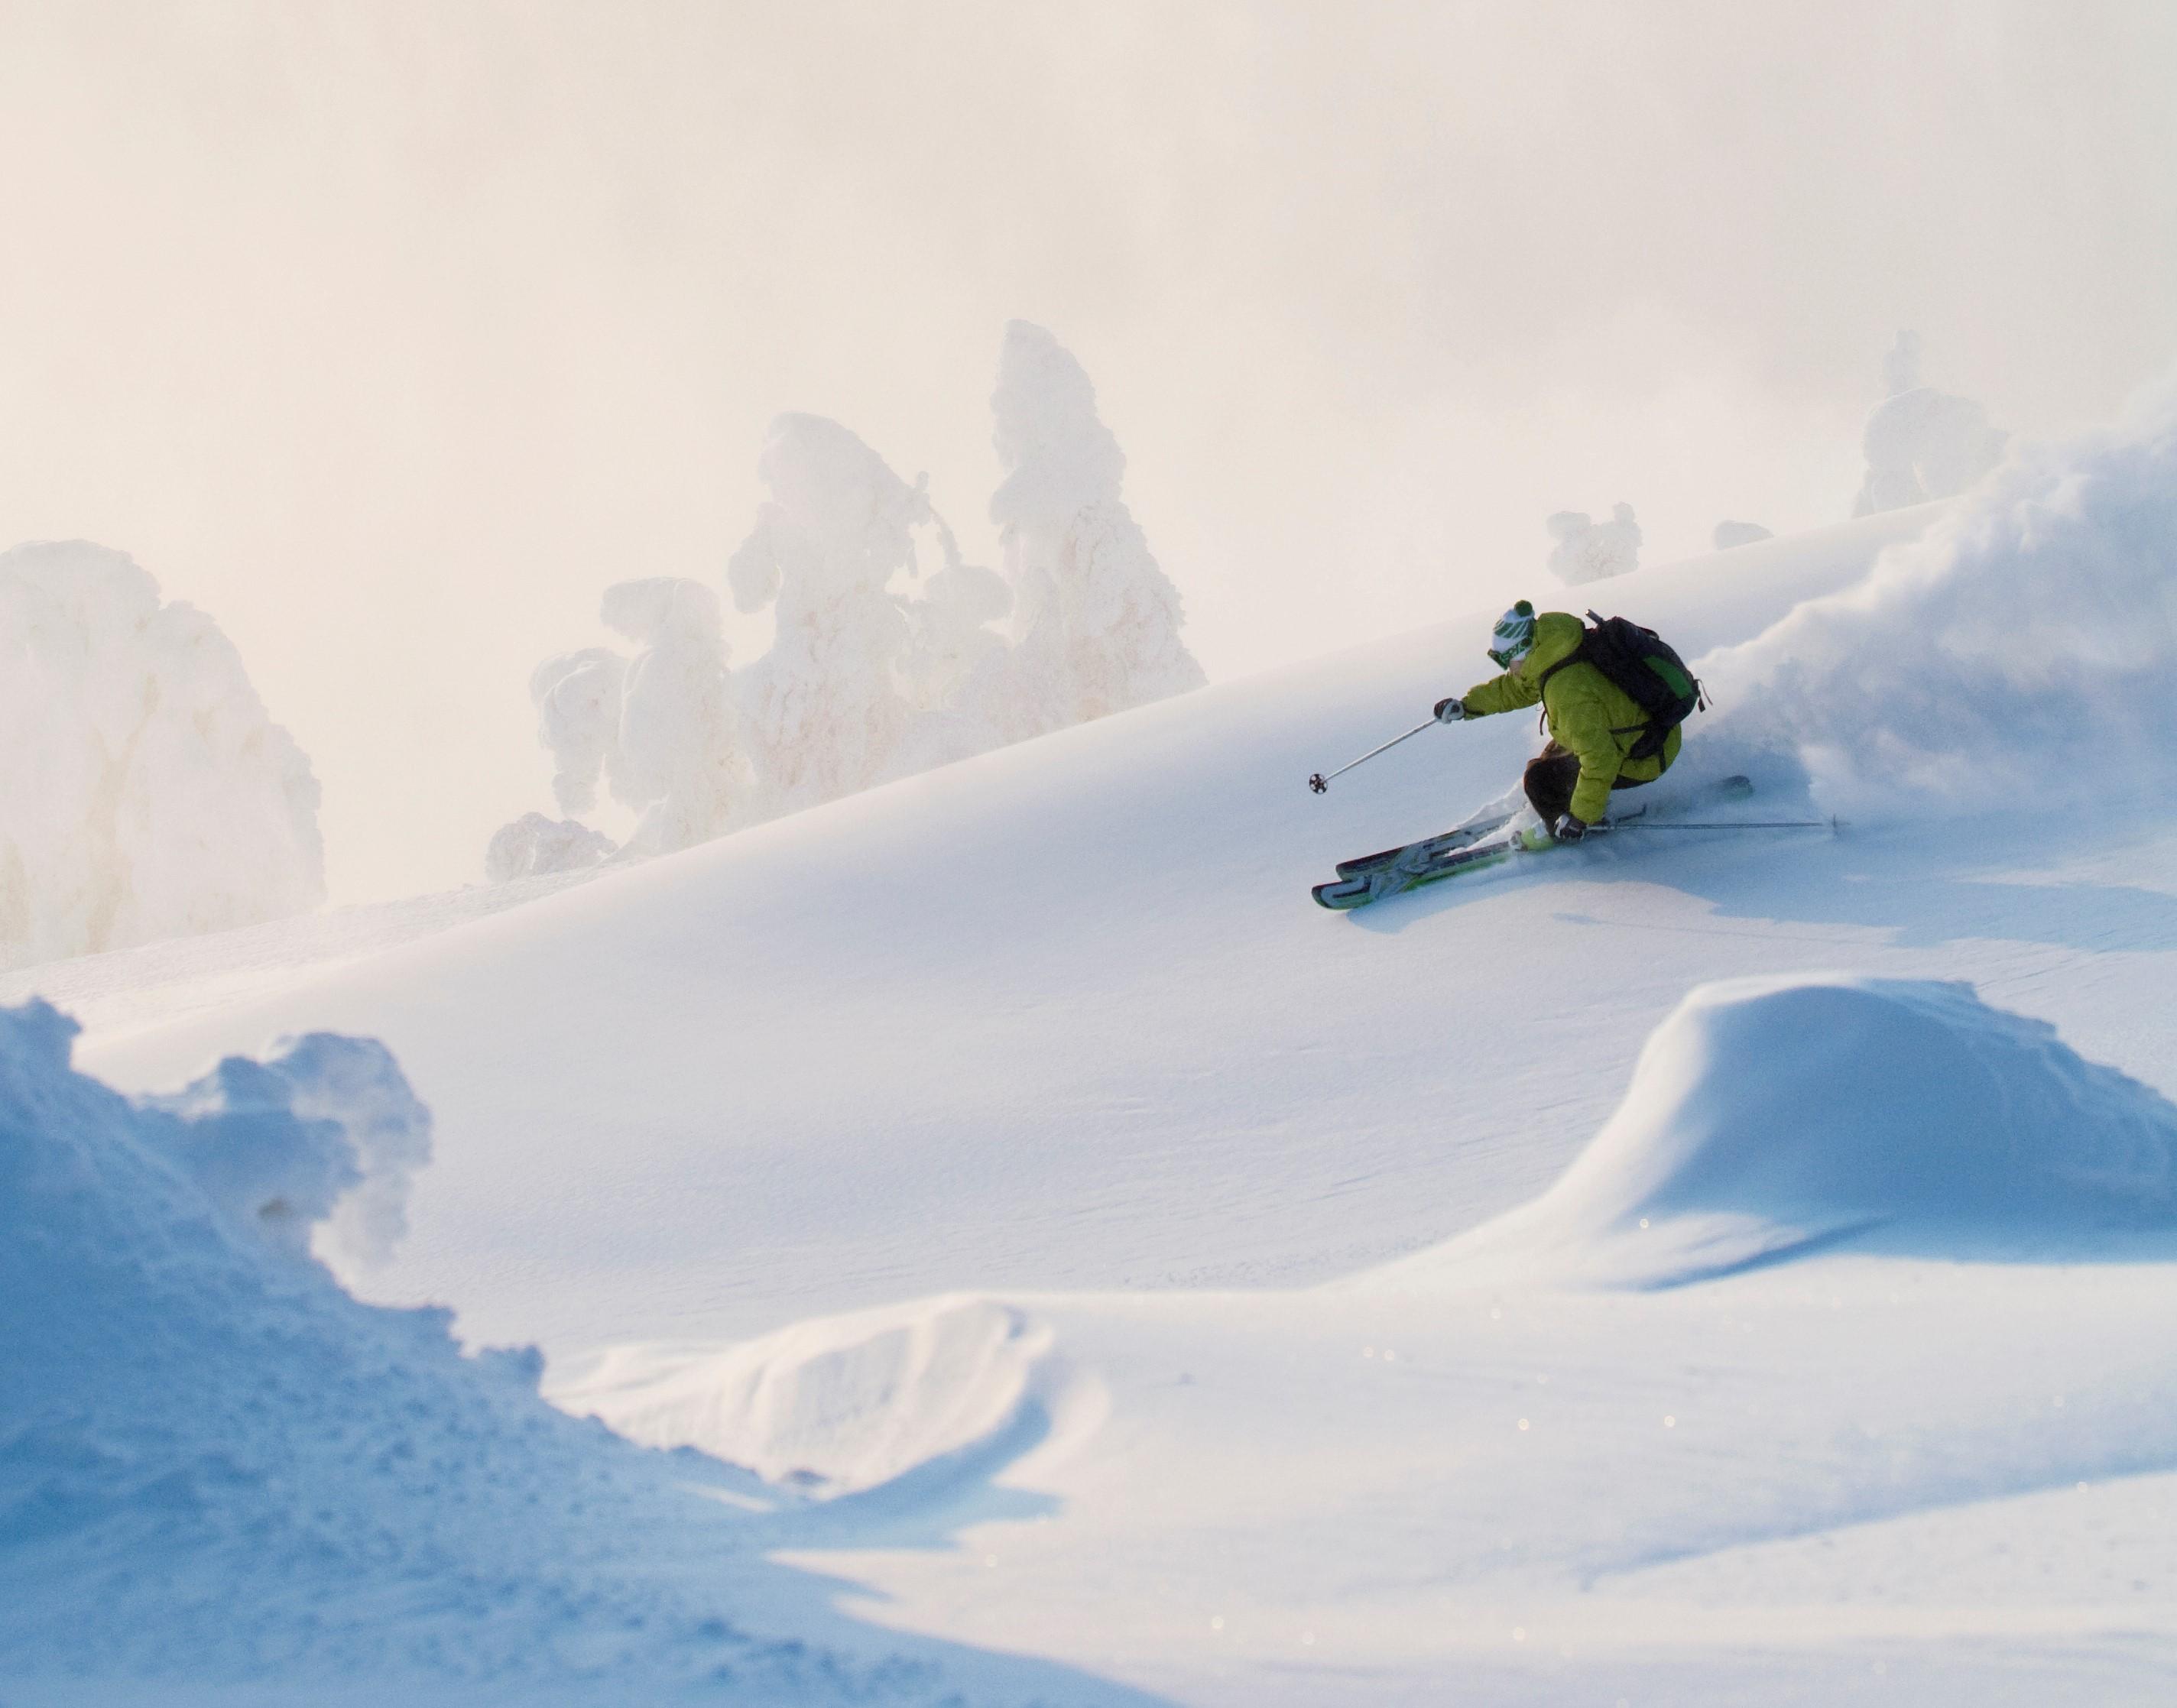 The best ski resorts in Finland. Ski resort Levi (Finland) 79